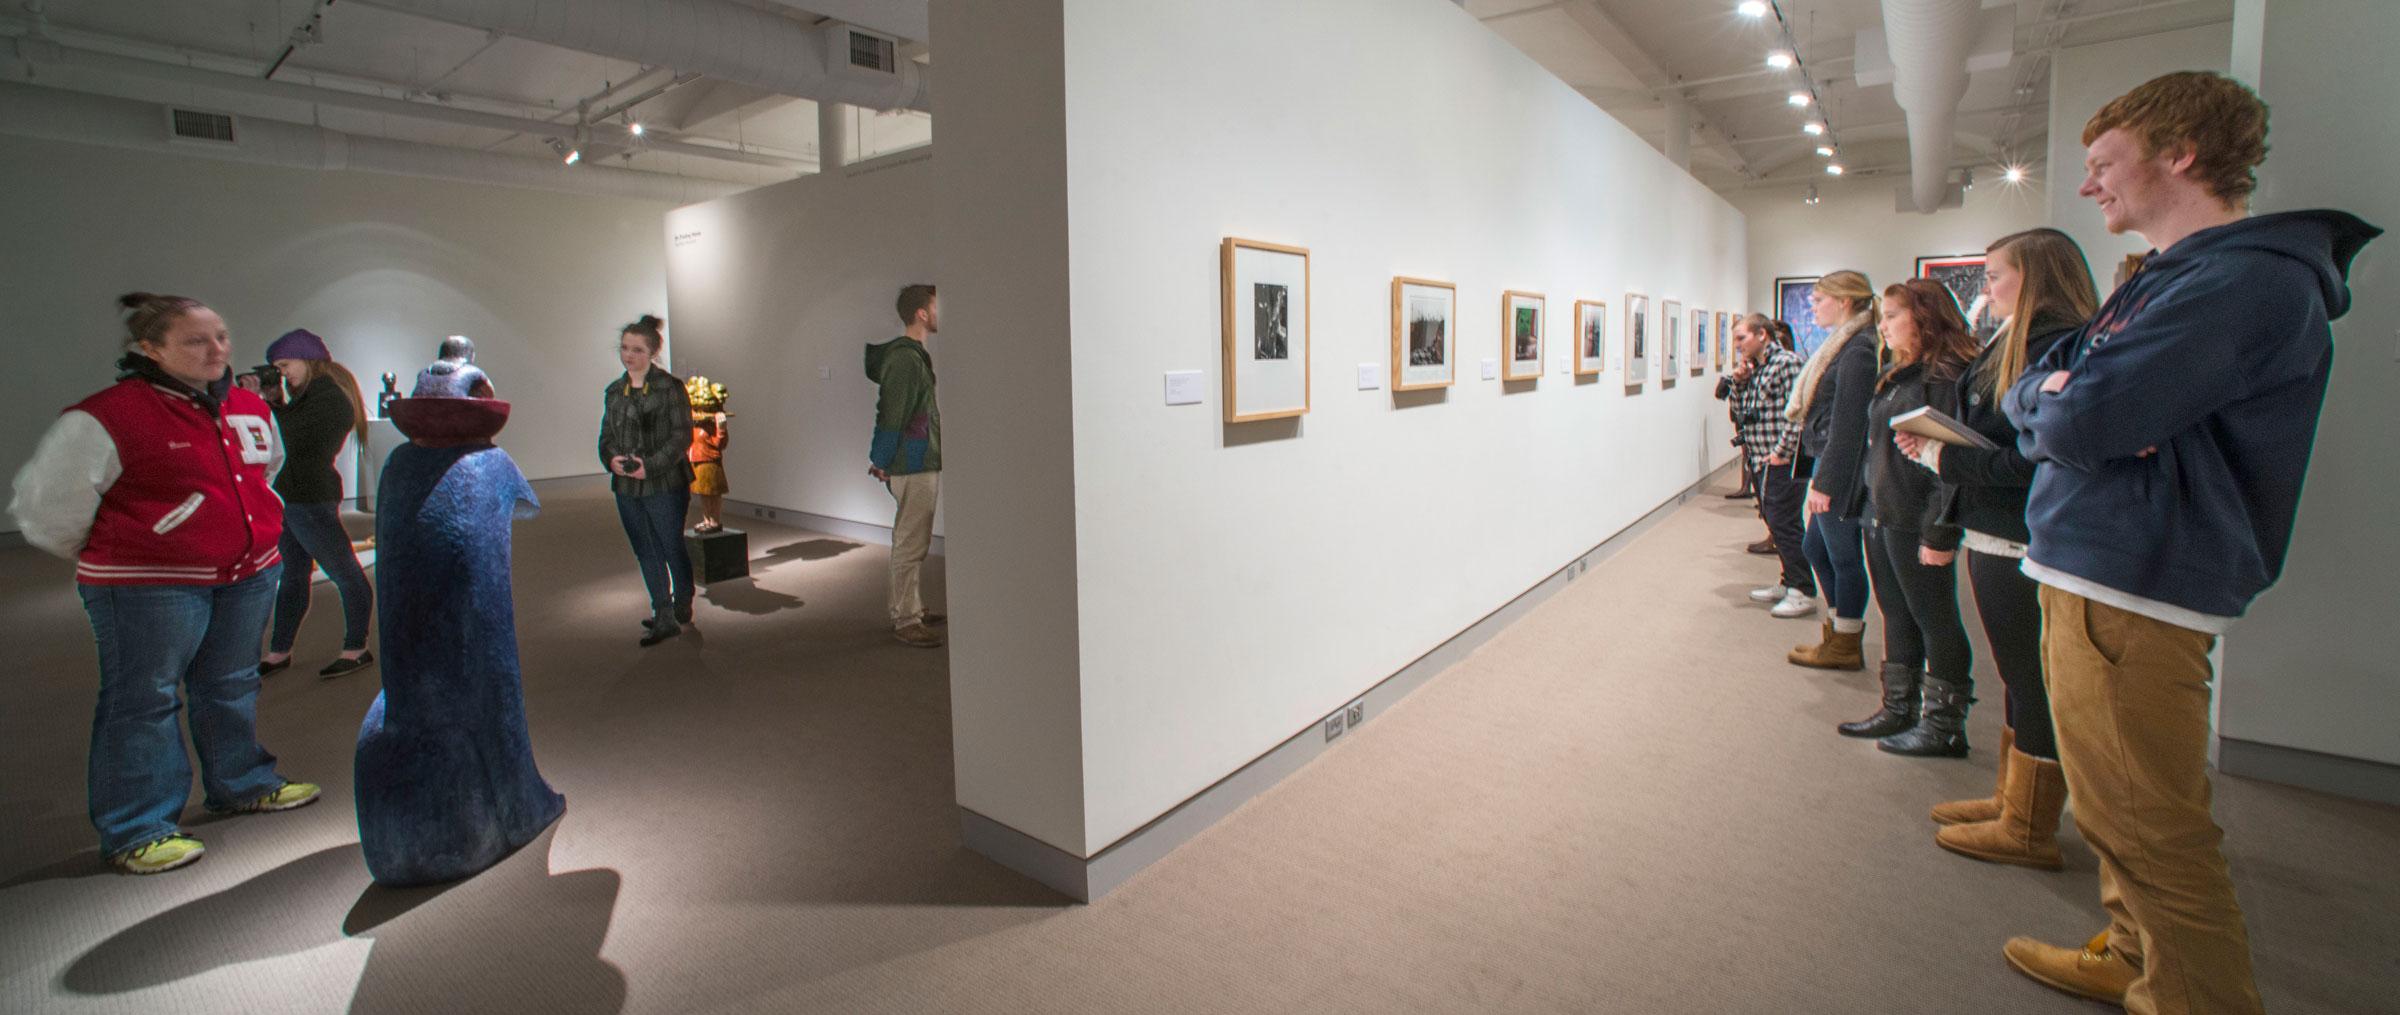 University of Maine Museum of Art — Maine's Modern and